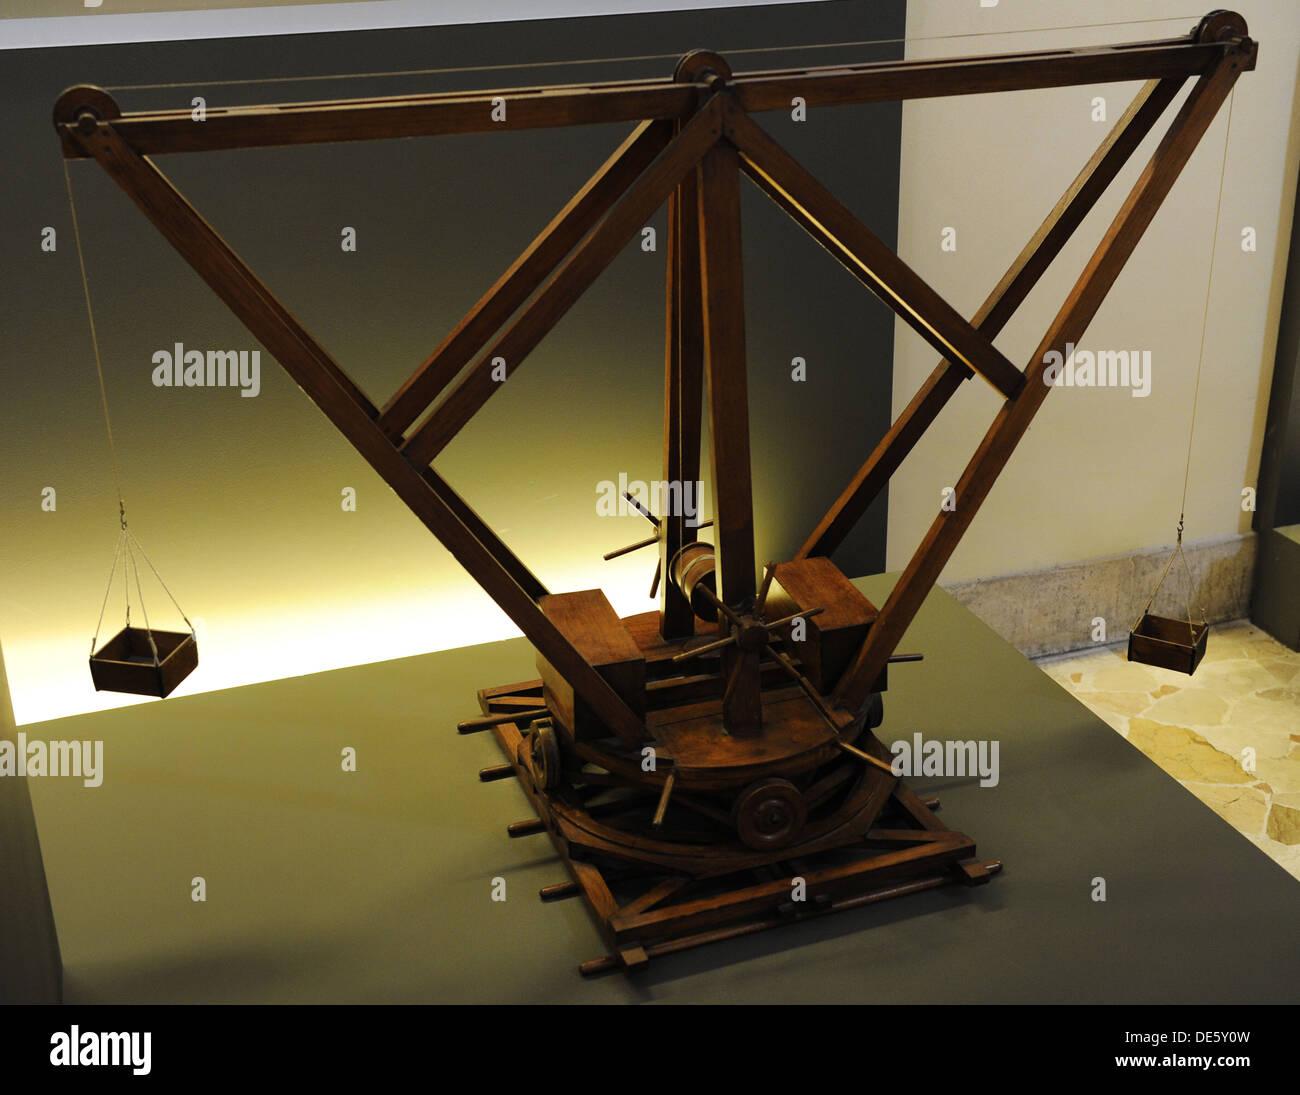 Machine. Crane with central winch. Codex Atlanticus. Model. - Stock Image